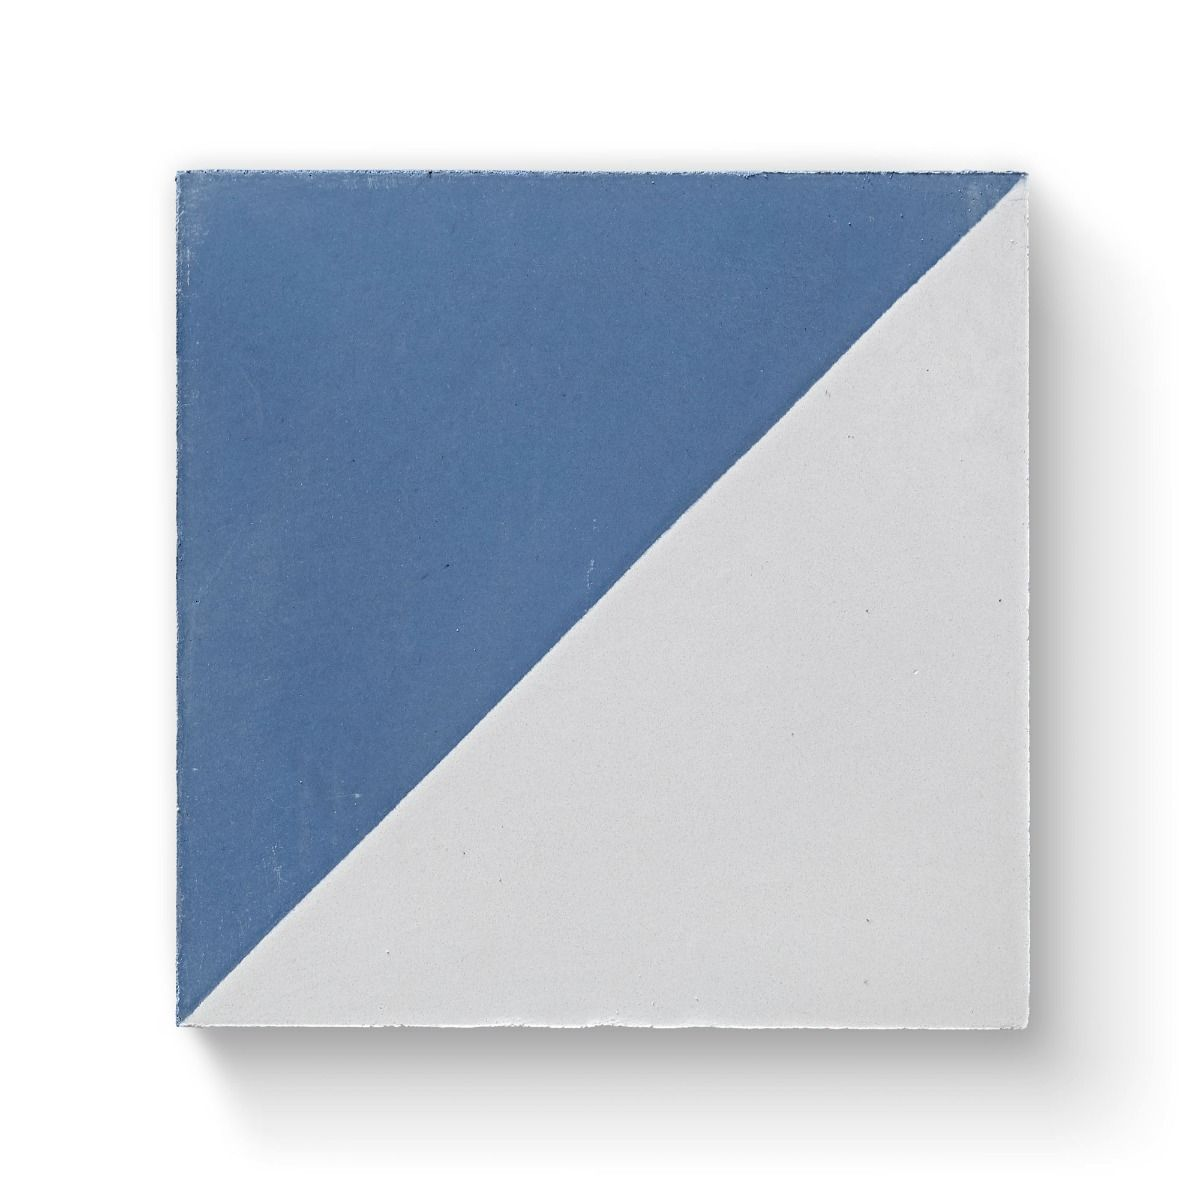 Bert & May Alalpardo Blue 20cm x 20cm